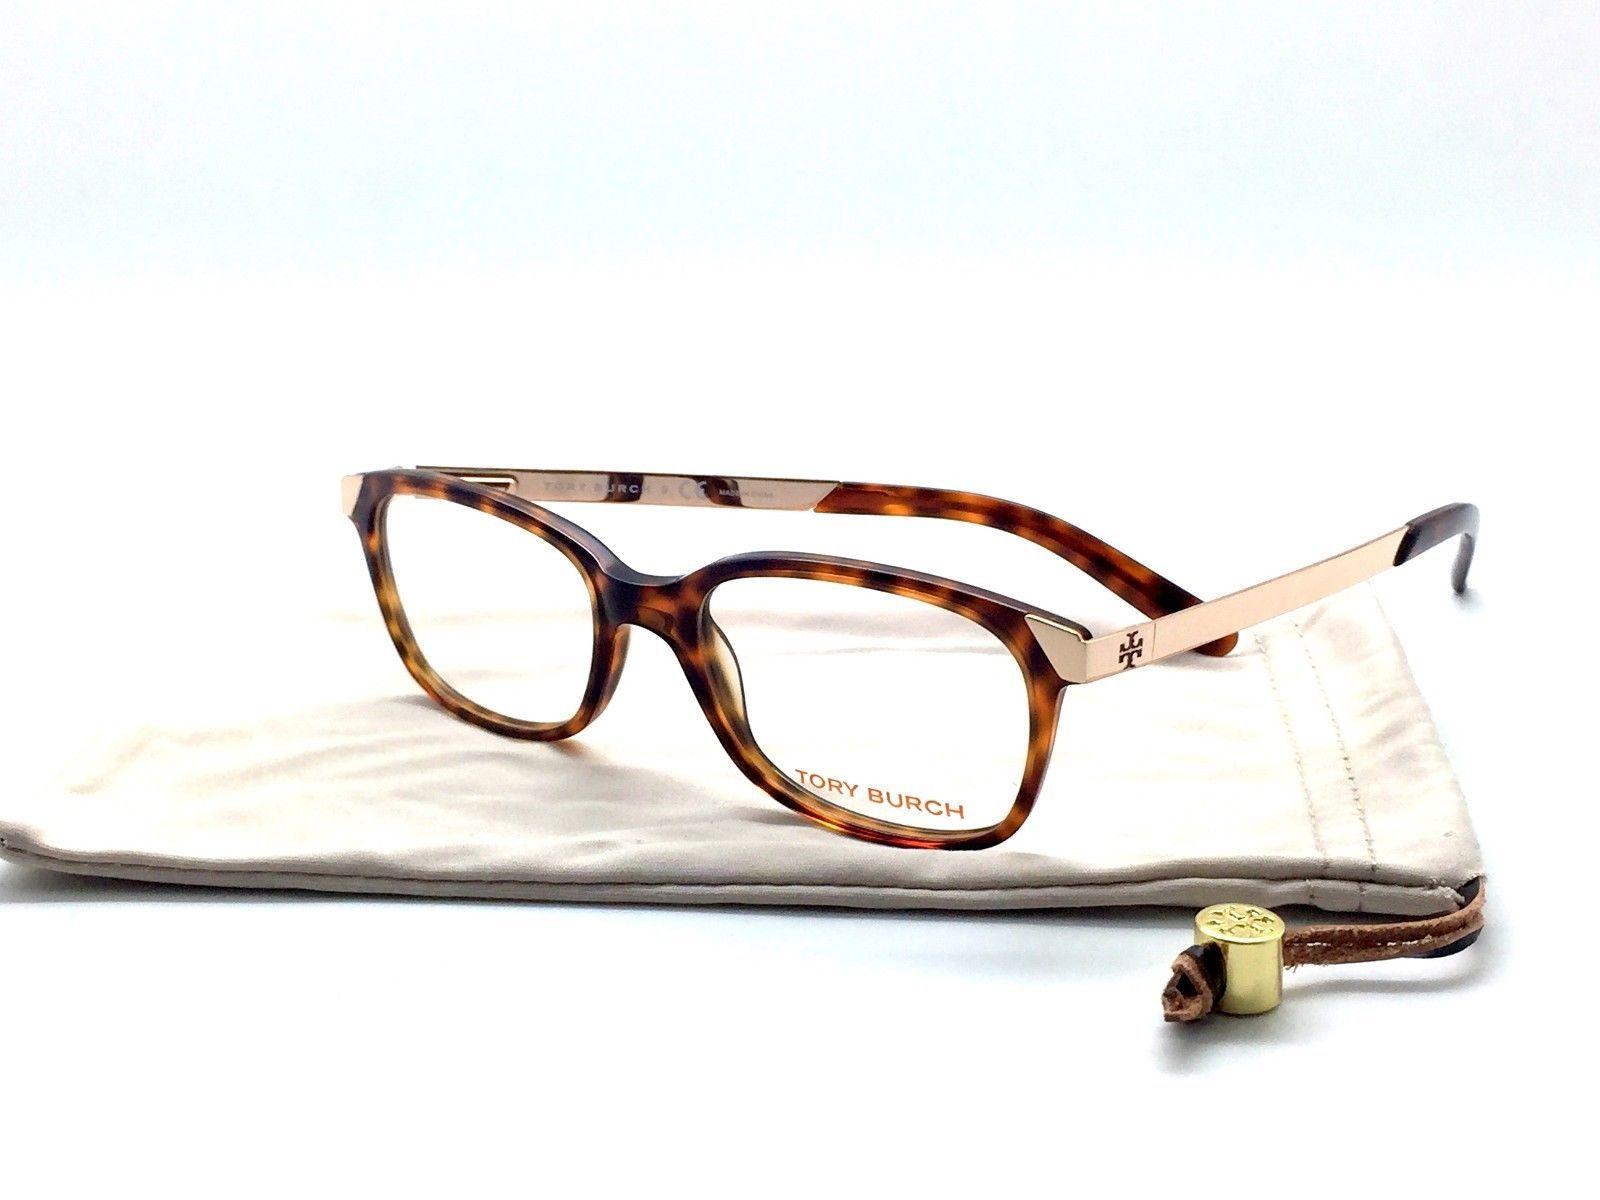 17a0b5af4b2a TORY BURCH Women's Blonde Tortoise 50mm Eyeglass Frames TY2006 838 - $68.53